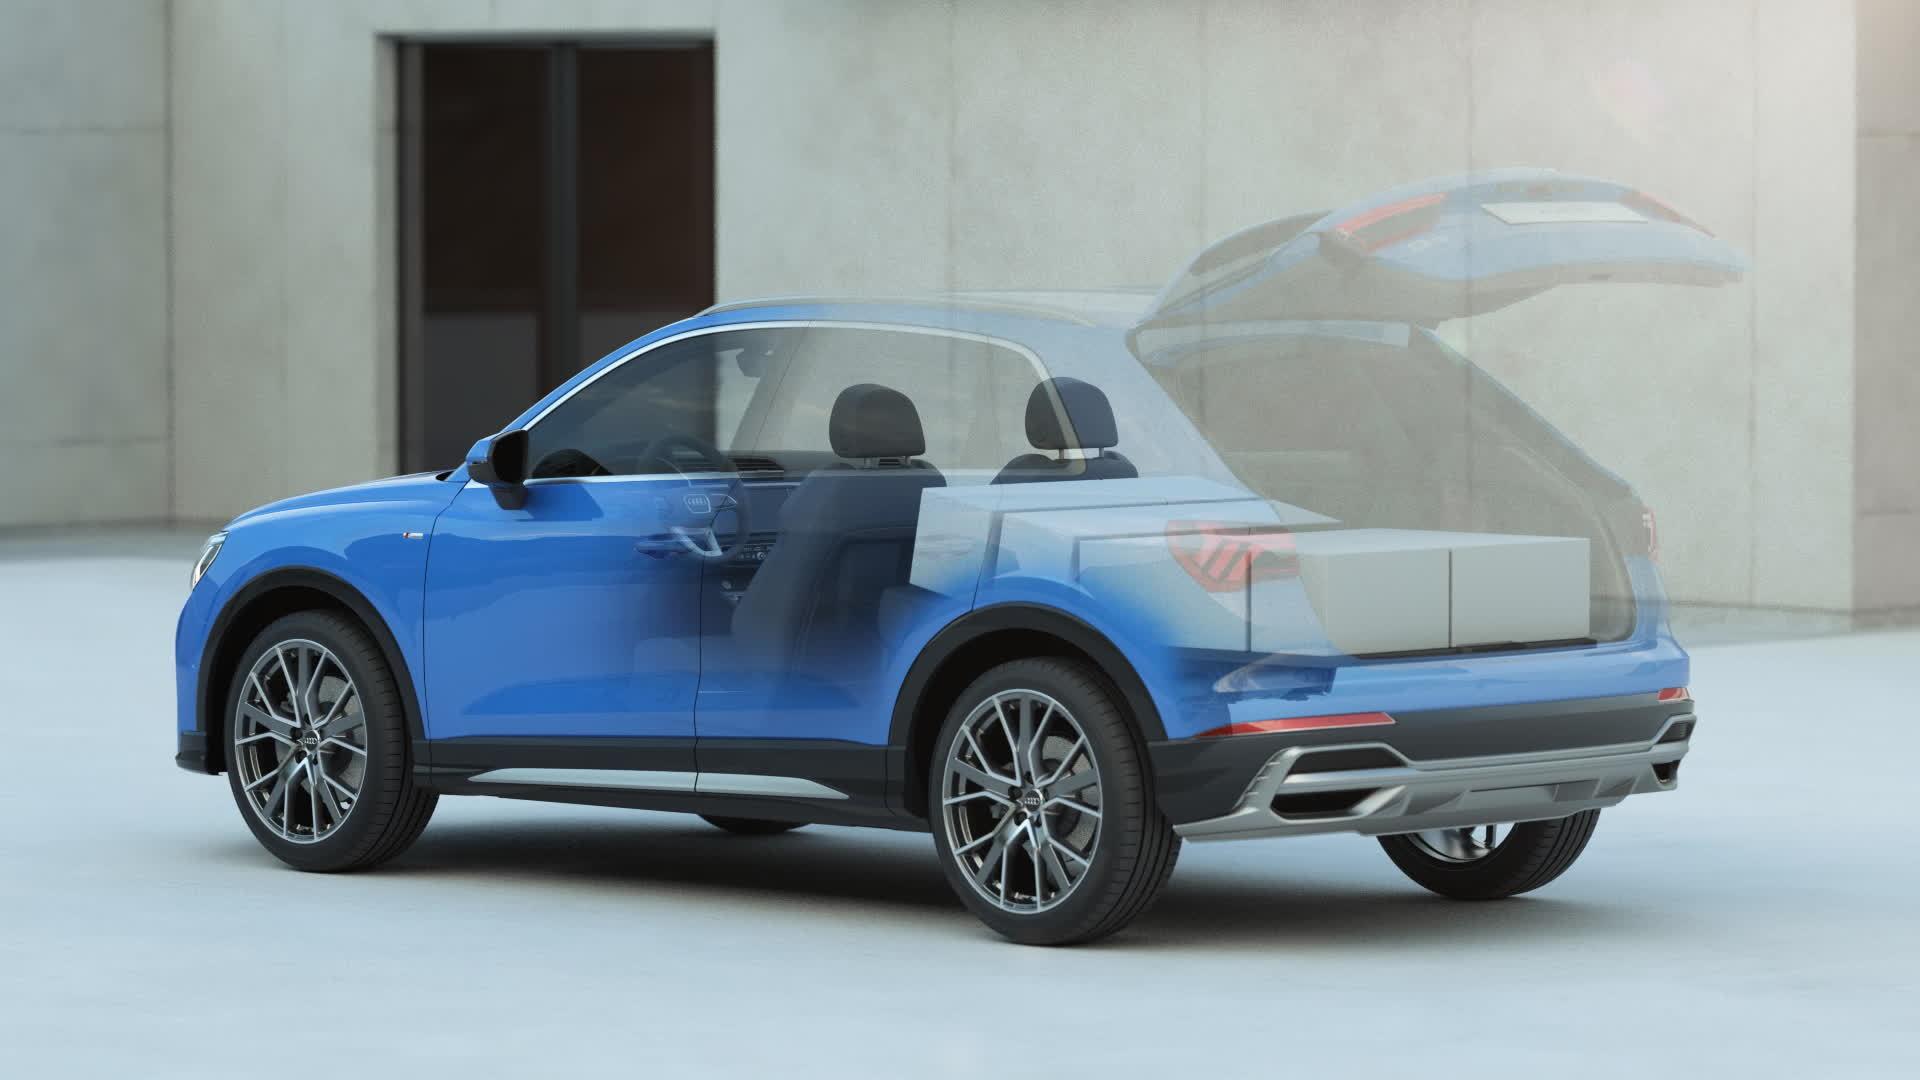 Audi Q3 loading and interior concept (animation)